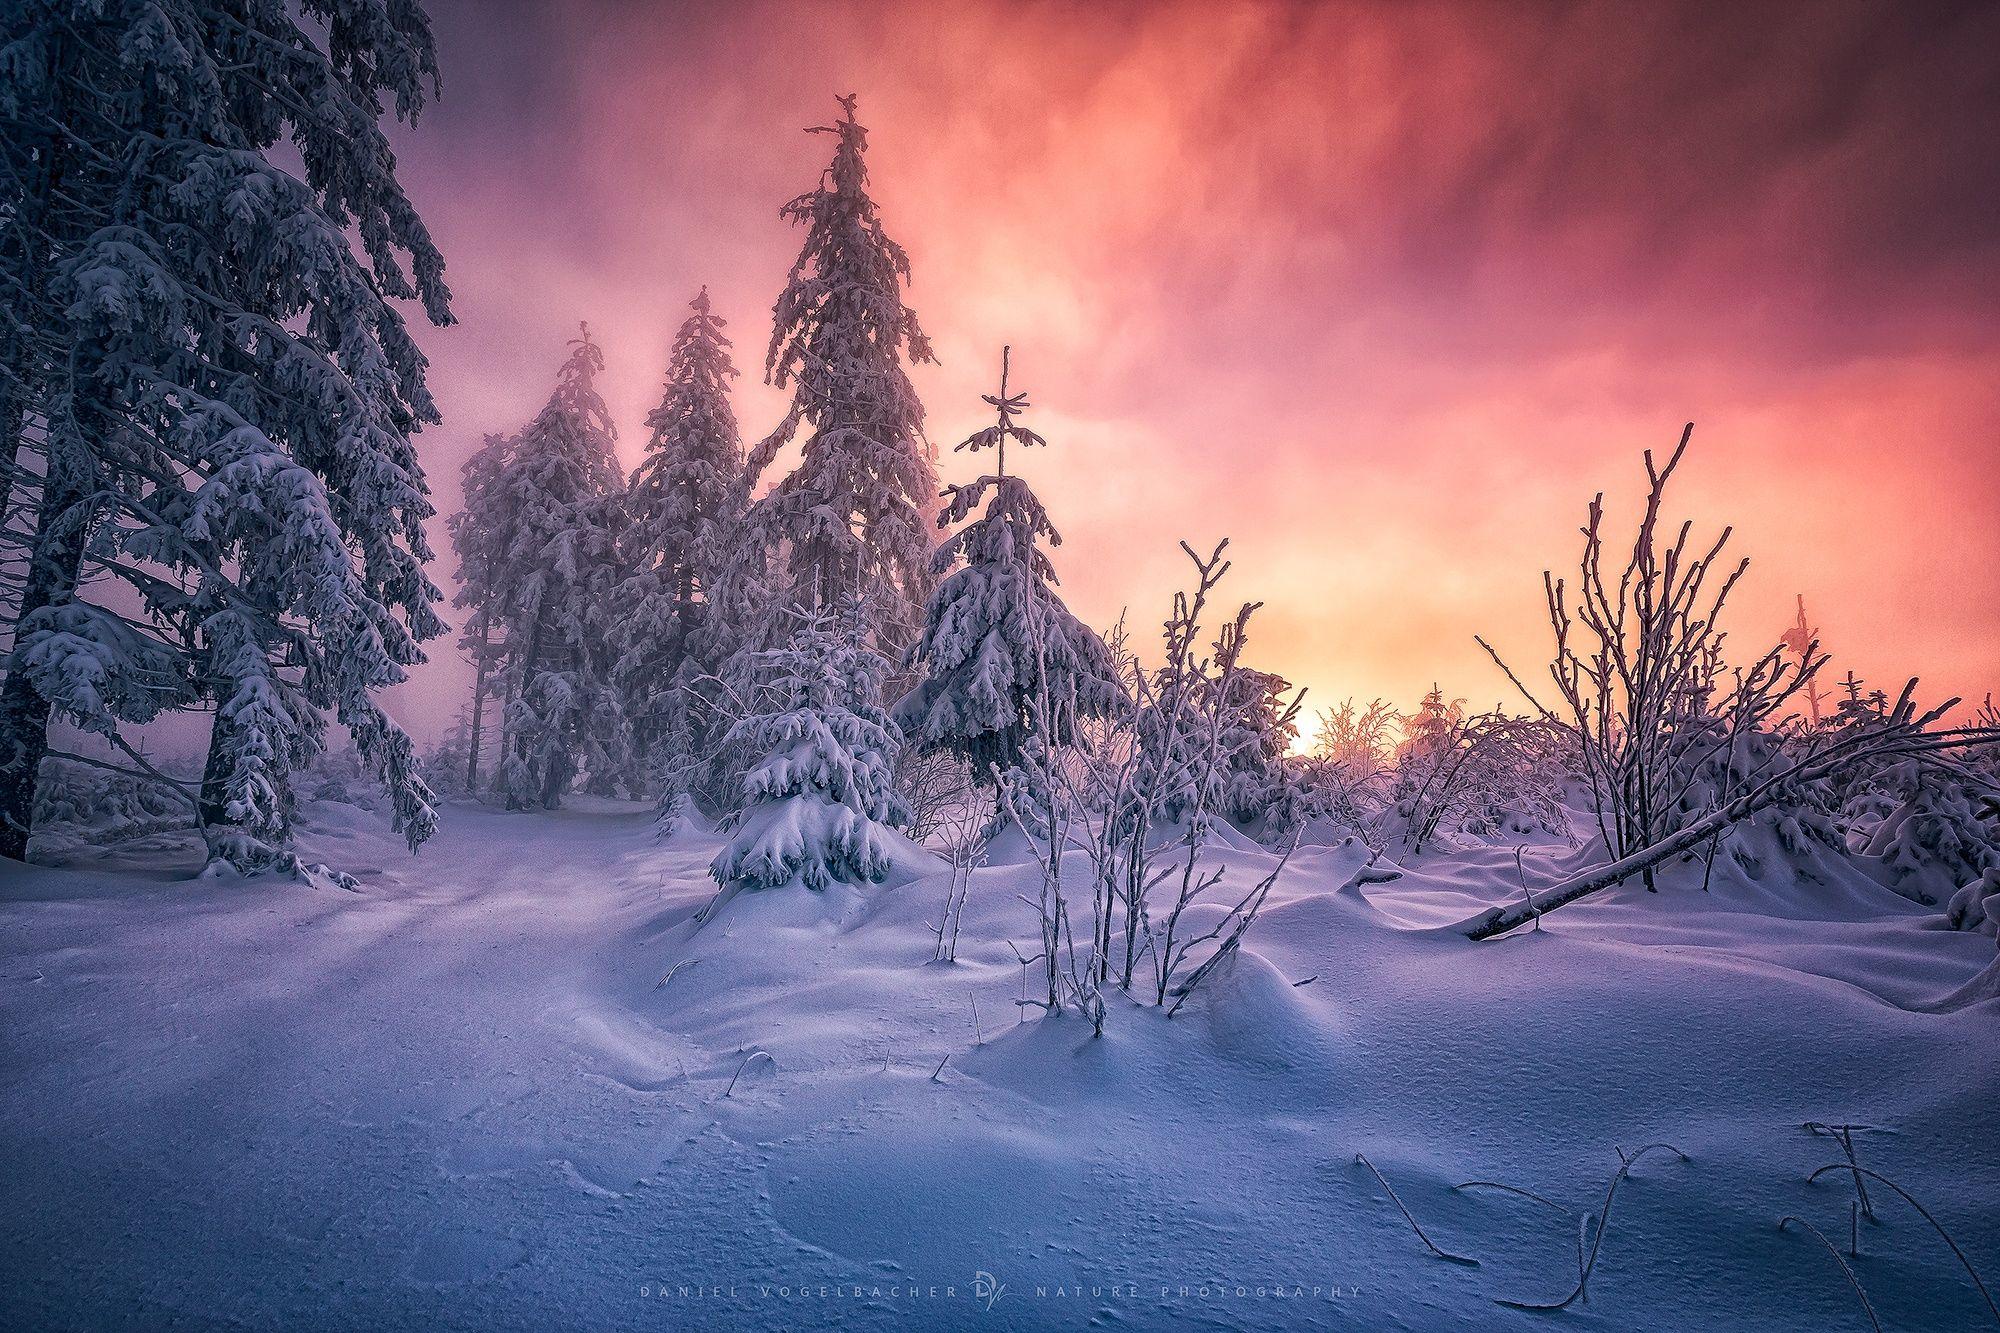 Best Of 2014 Top 10 People Photos Winter Landscape Photography Winter Landscape Forest Photography